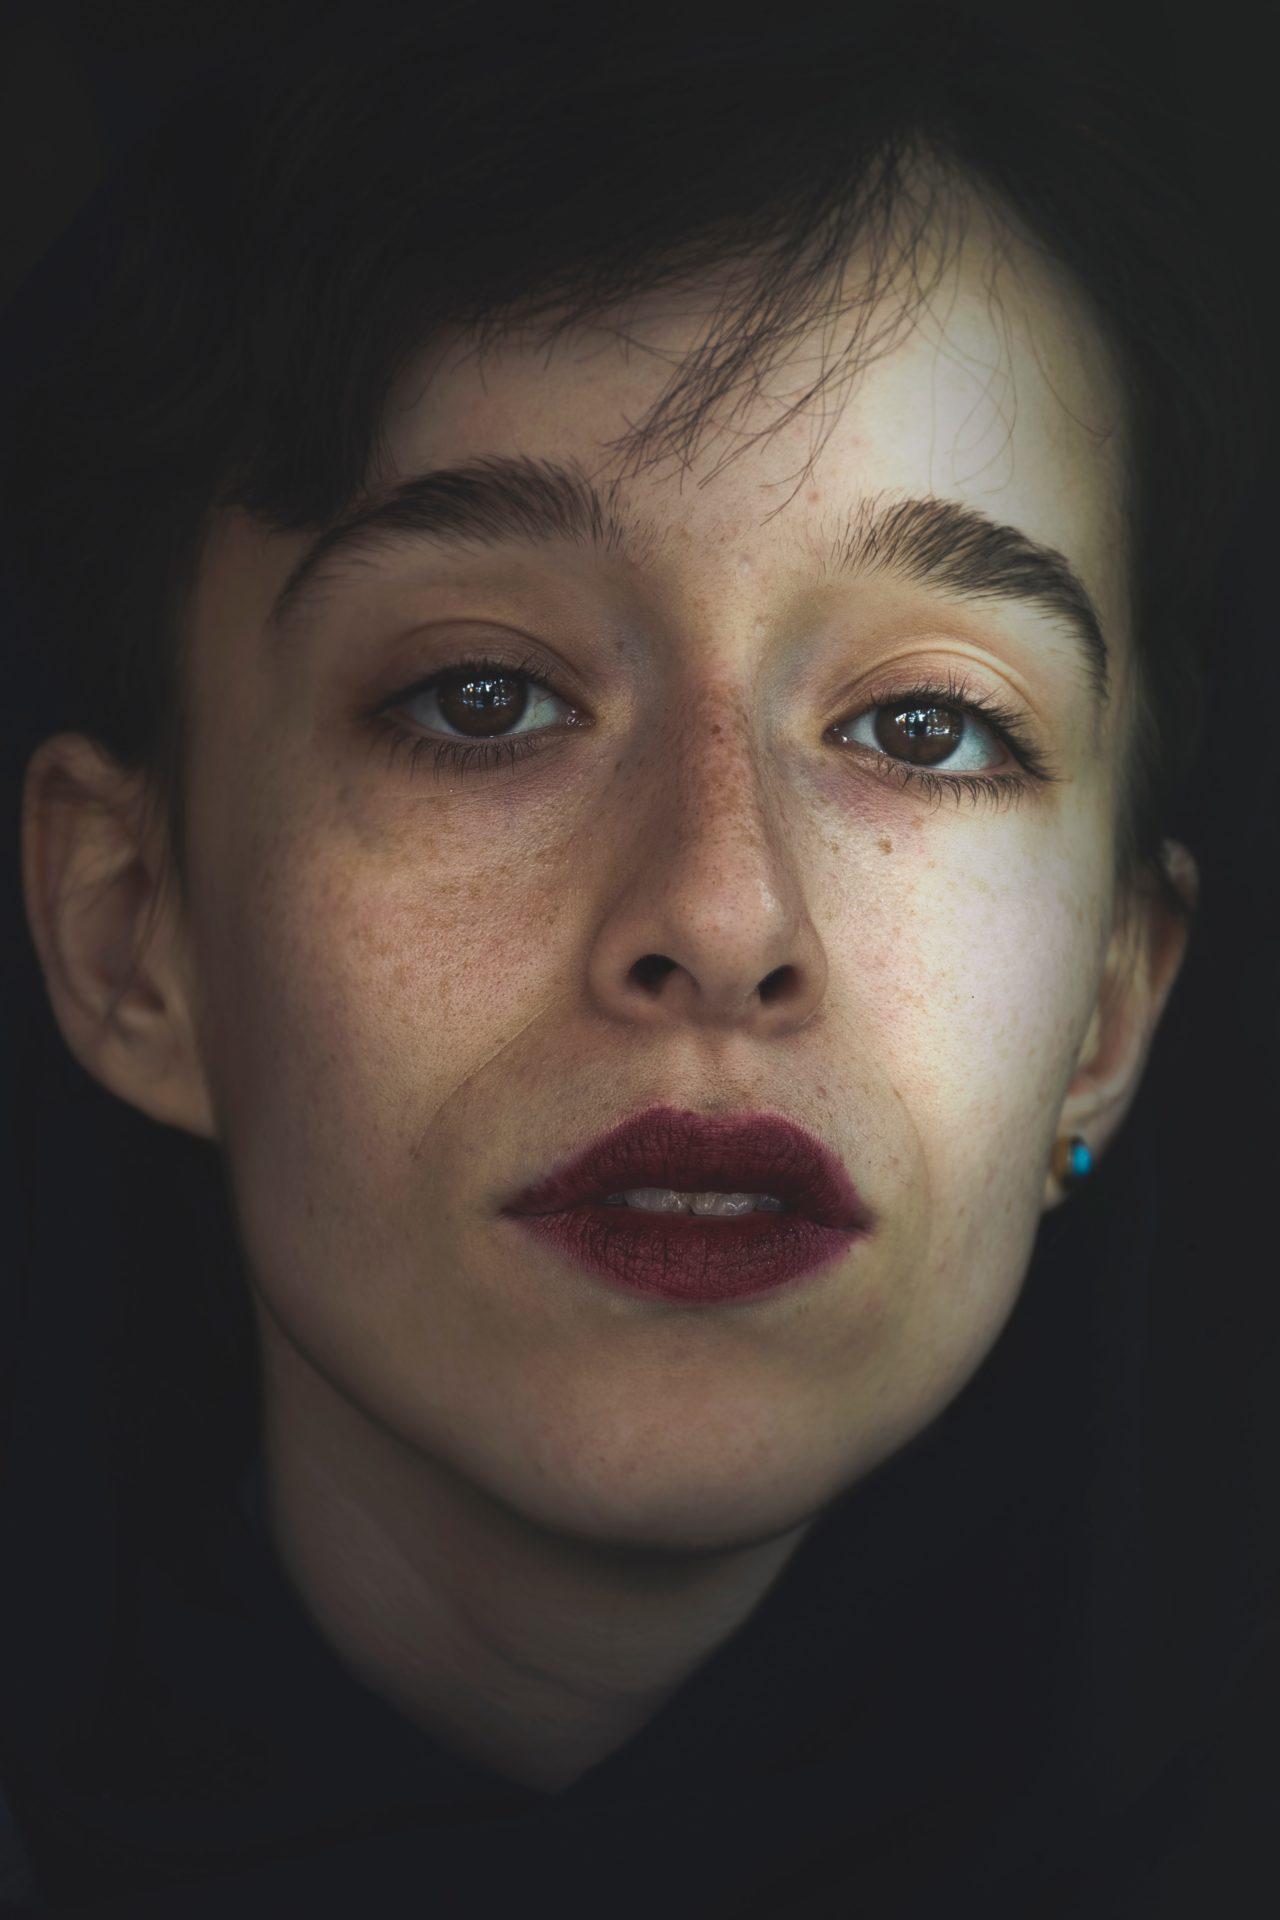 hesam jr TAGFNCnw7f4 unsplash - たるみ顔の原因とたるみ顔を解消するシンプルな方法